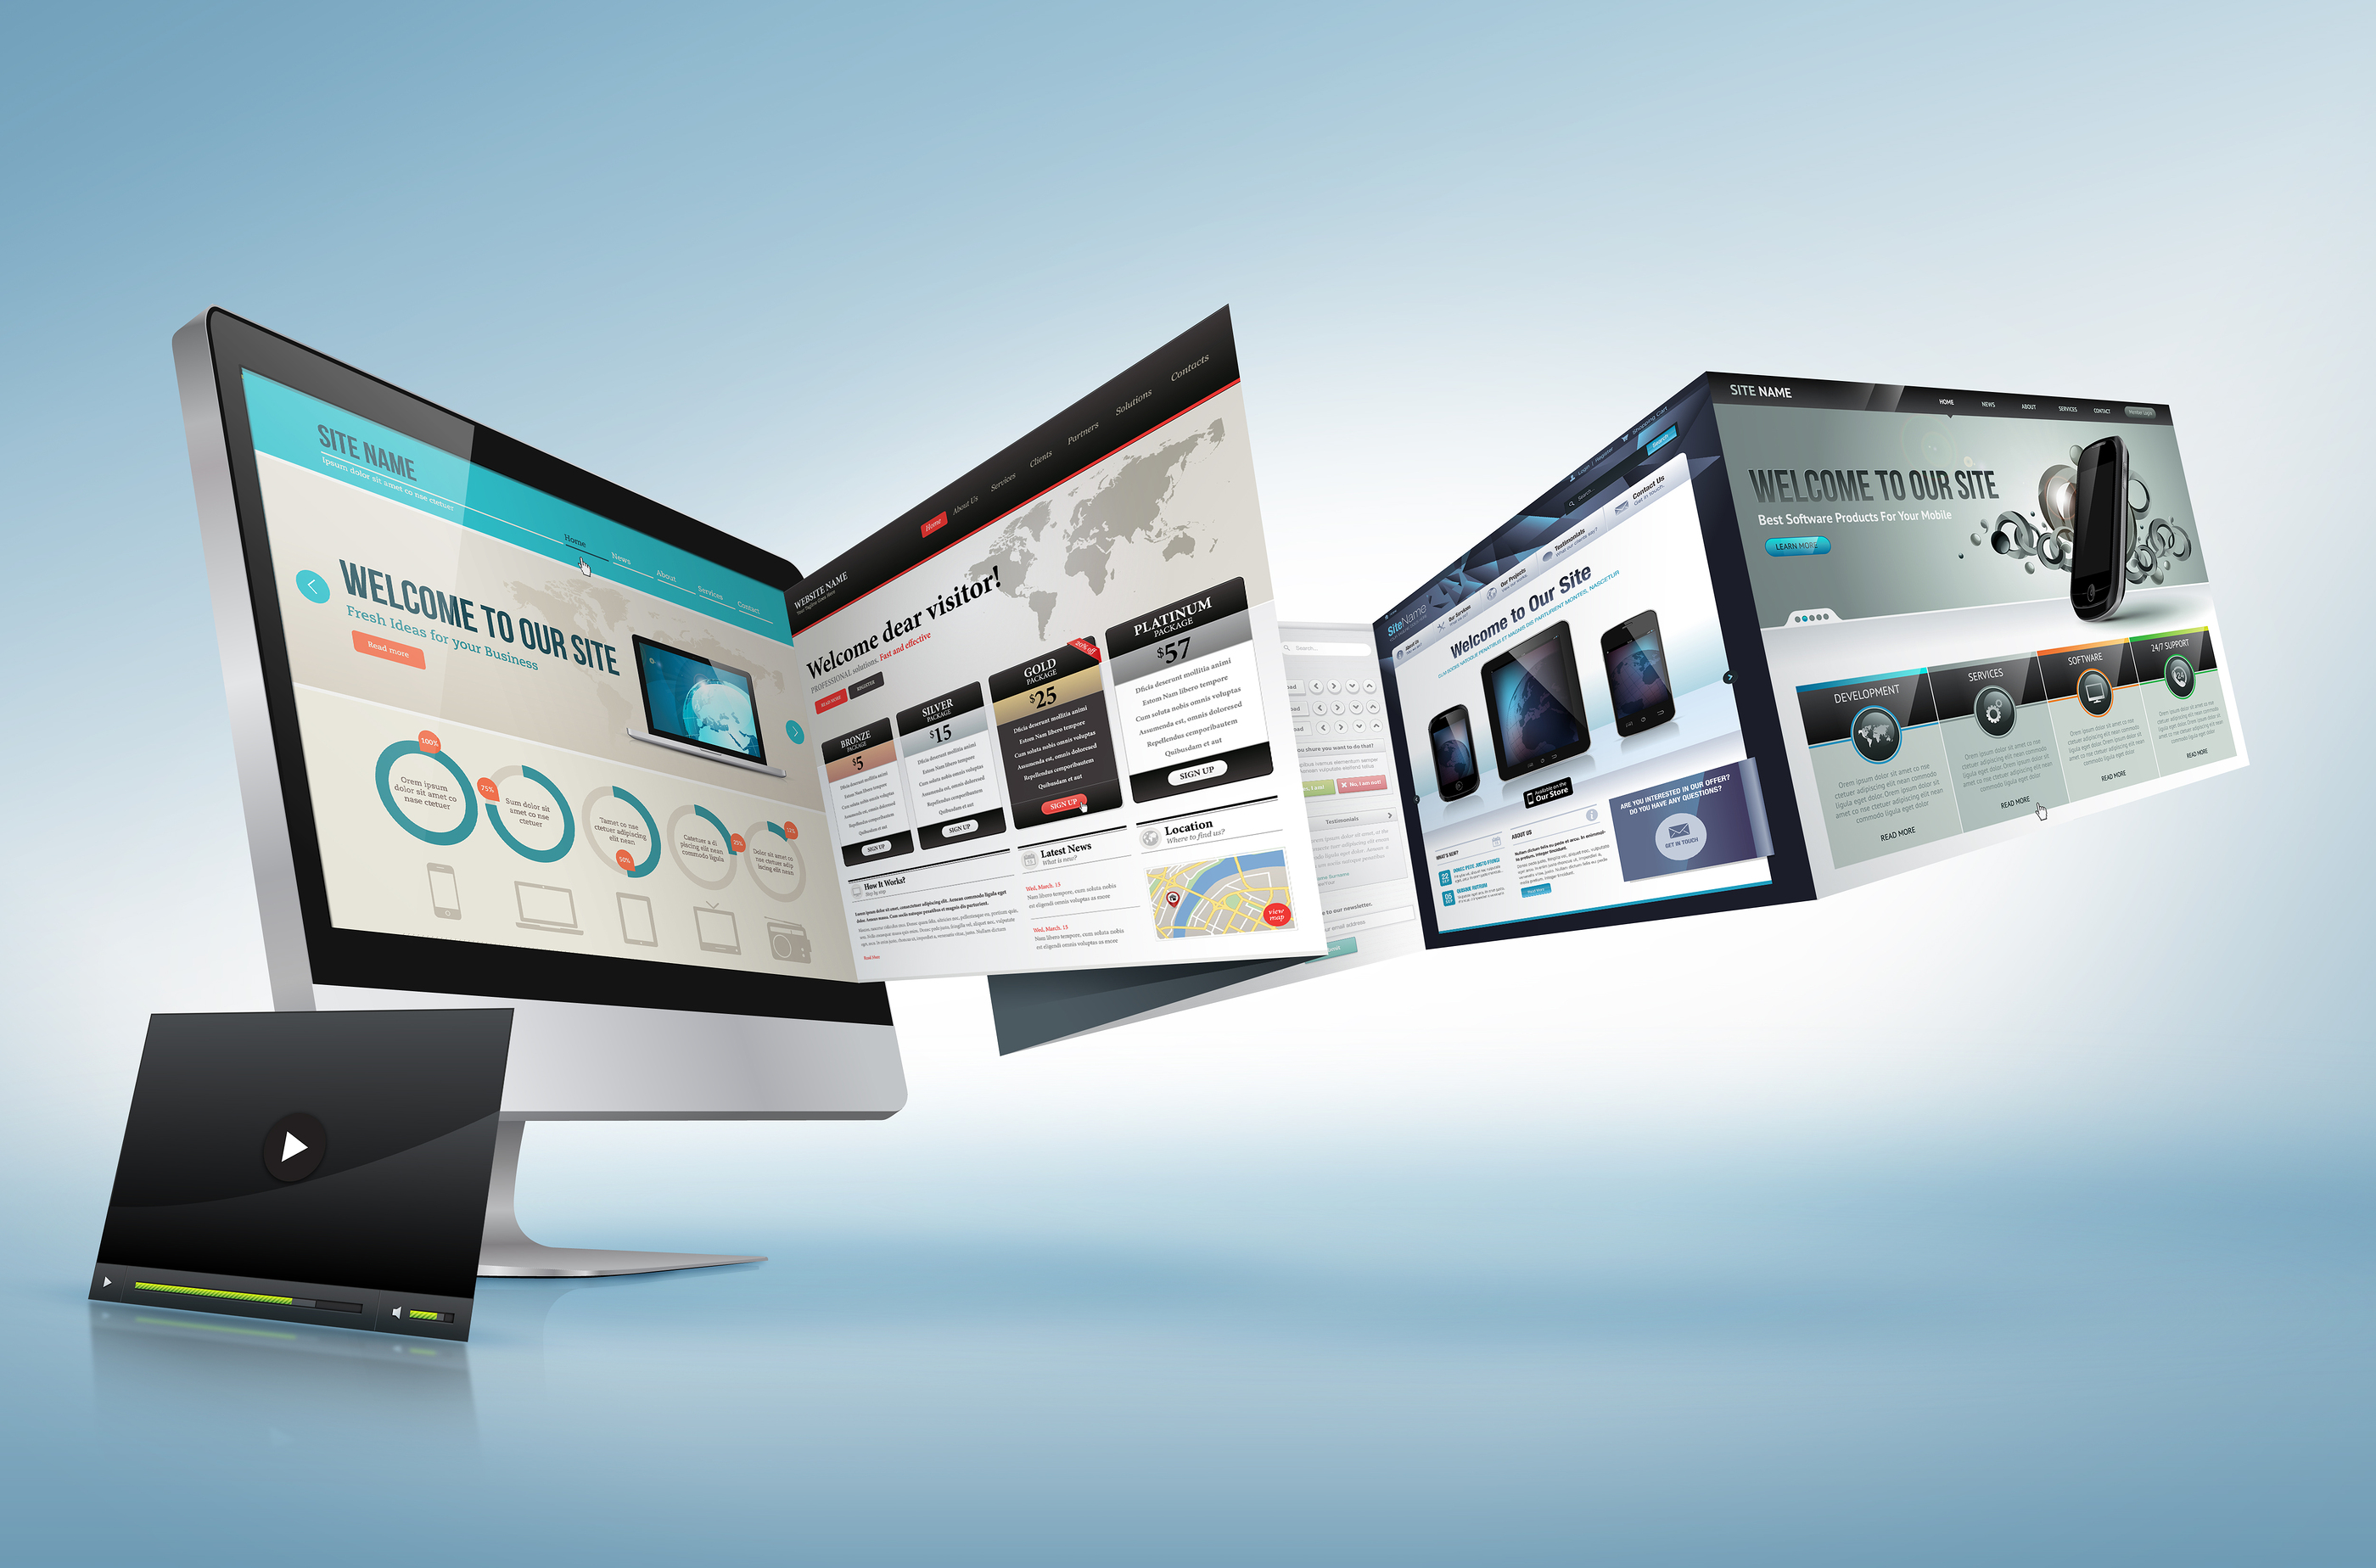 white label website design services dorset